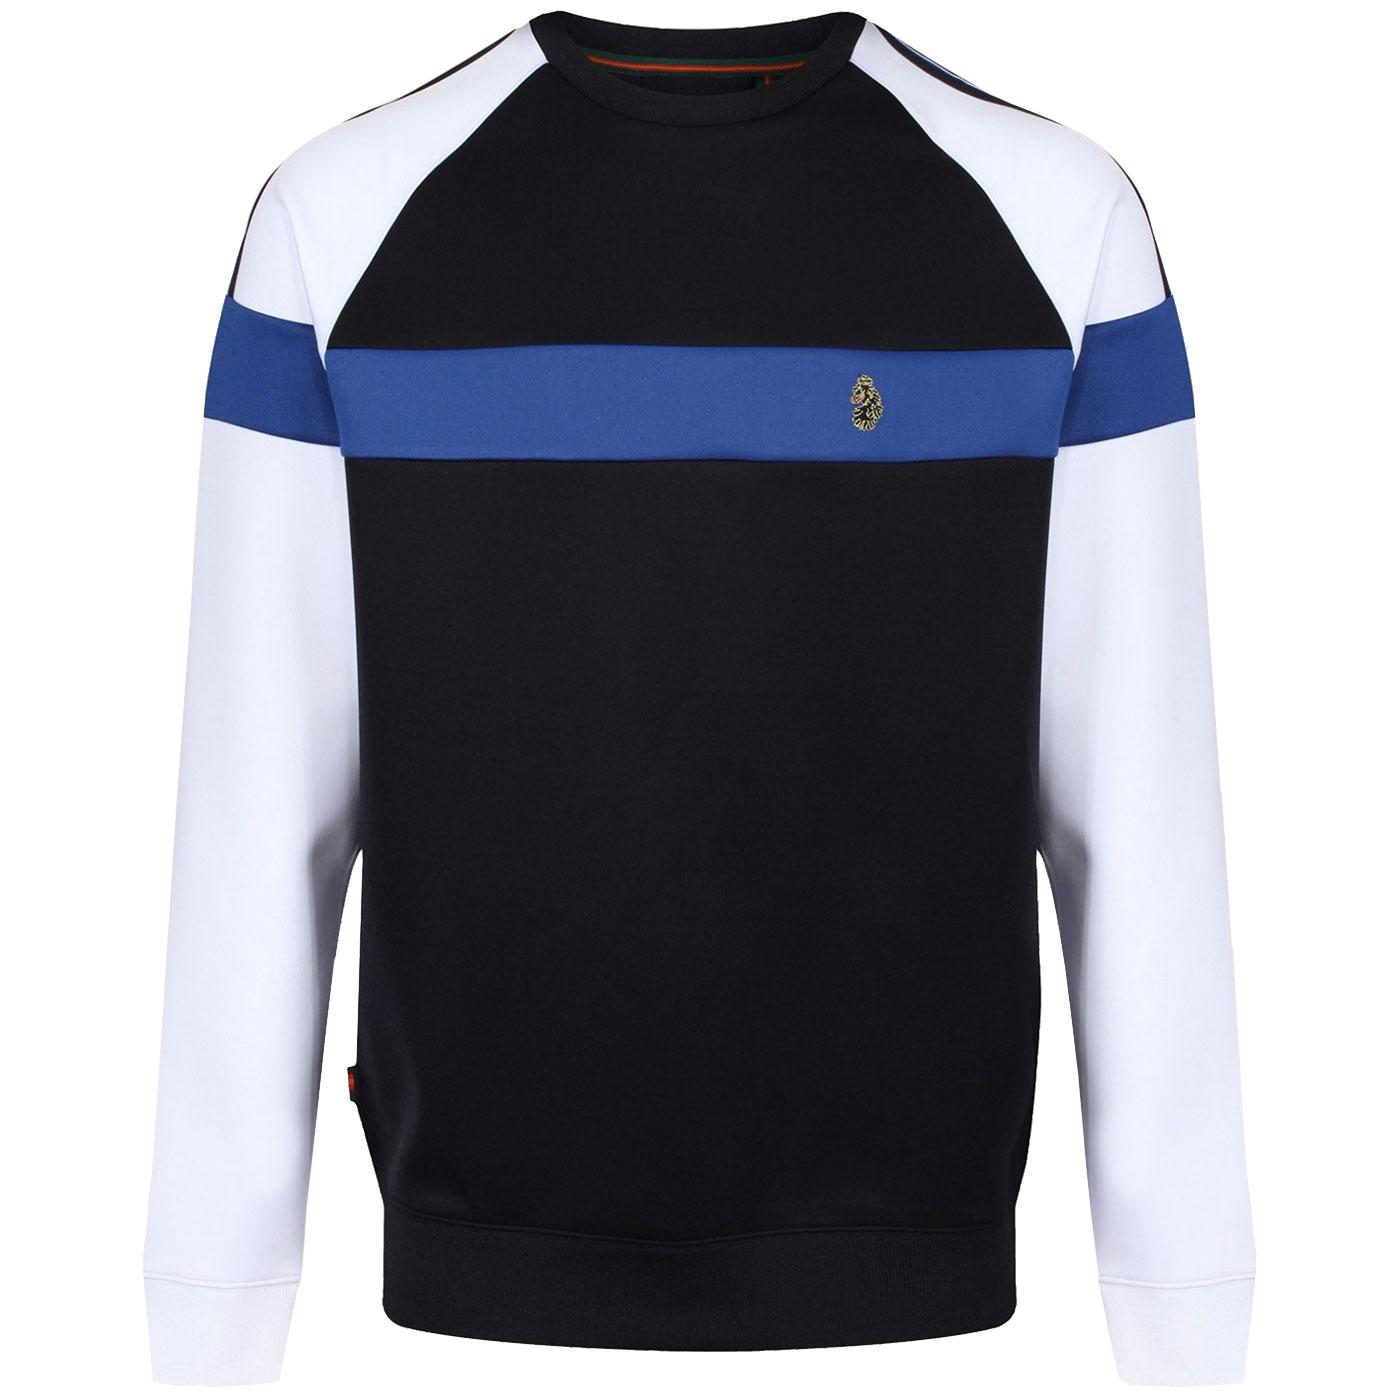 LUKE Adam 3 Retro Indie Colour Block Sweatshirt DN